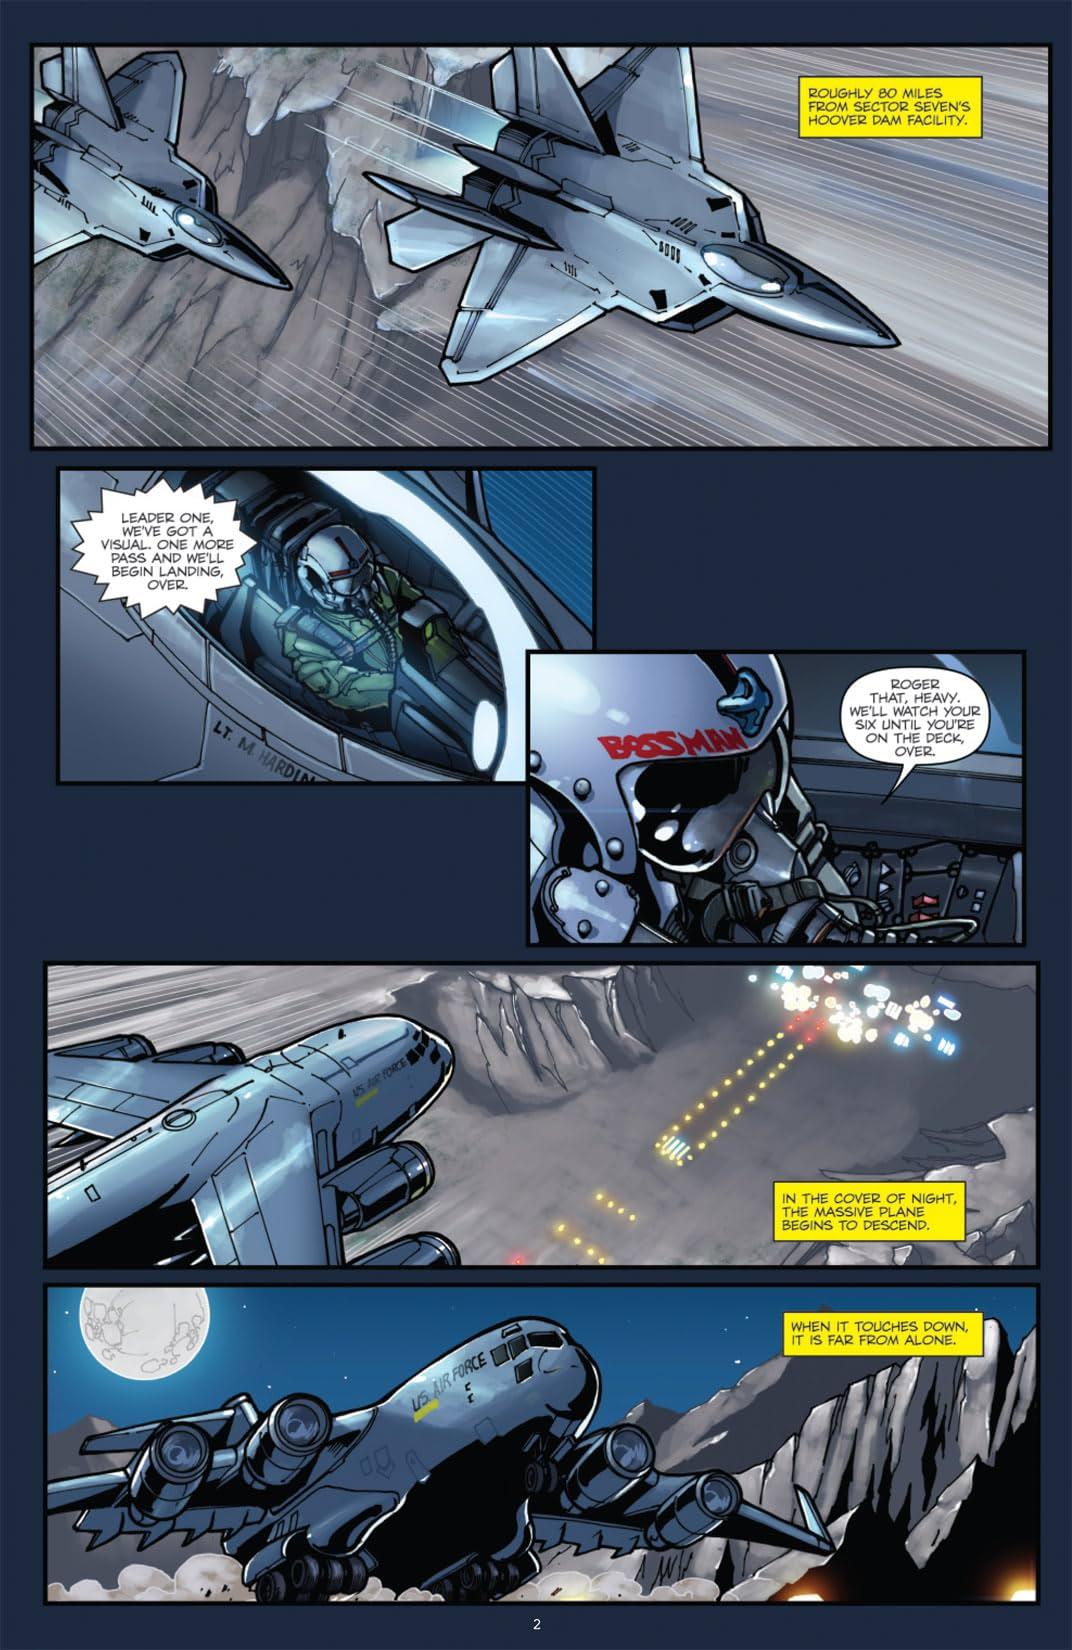 Transformers: Alliance - The Revenge of the Fallen Movie Prequel #1